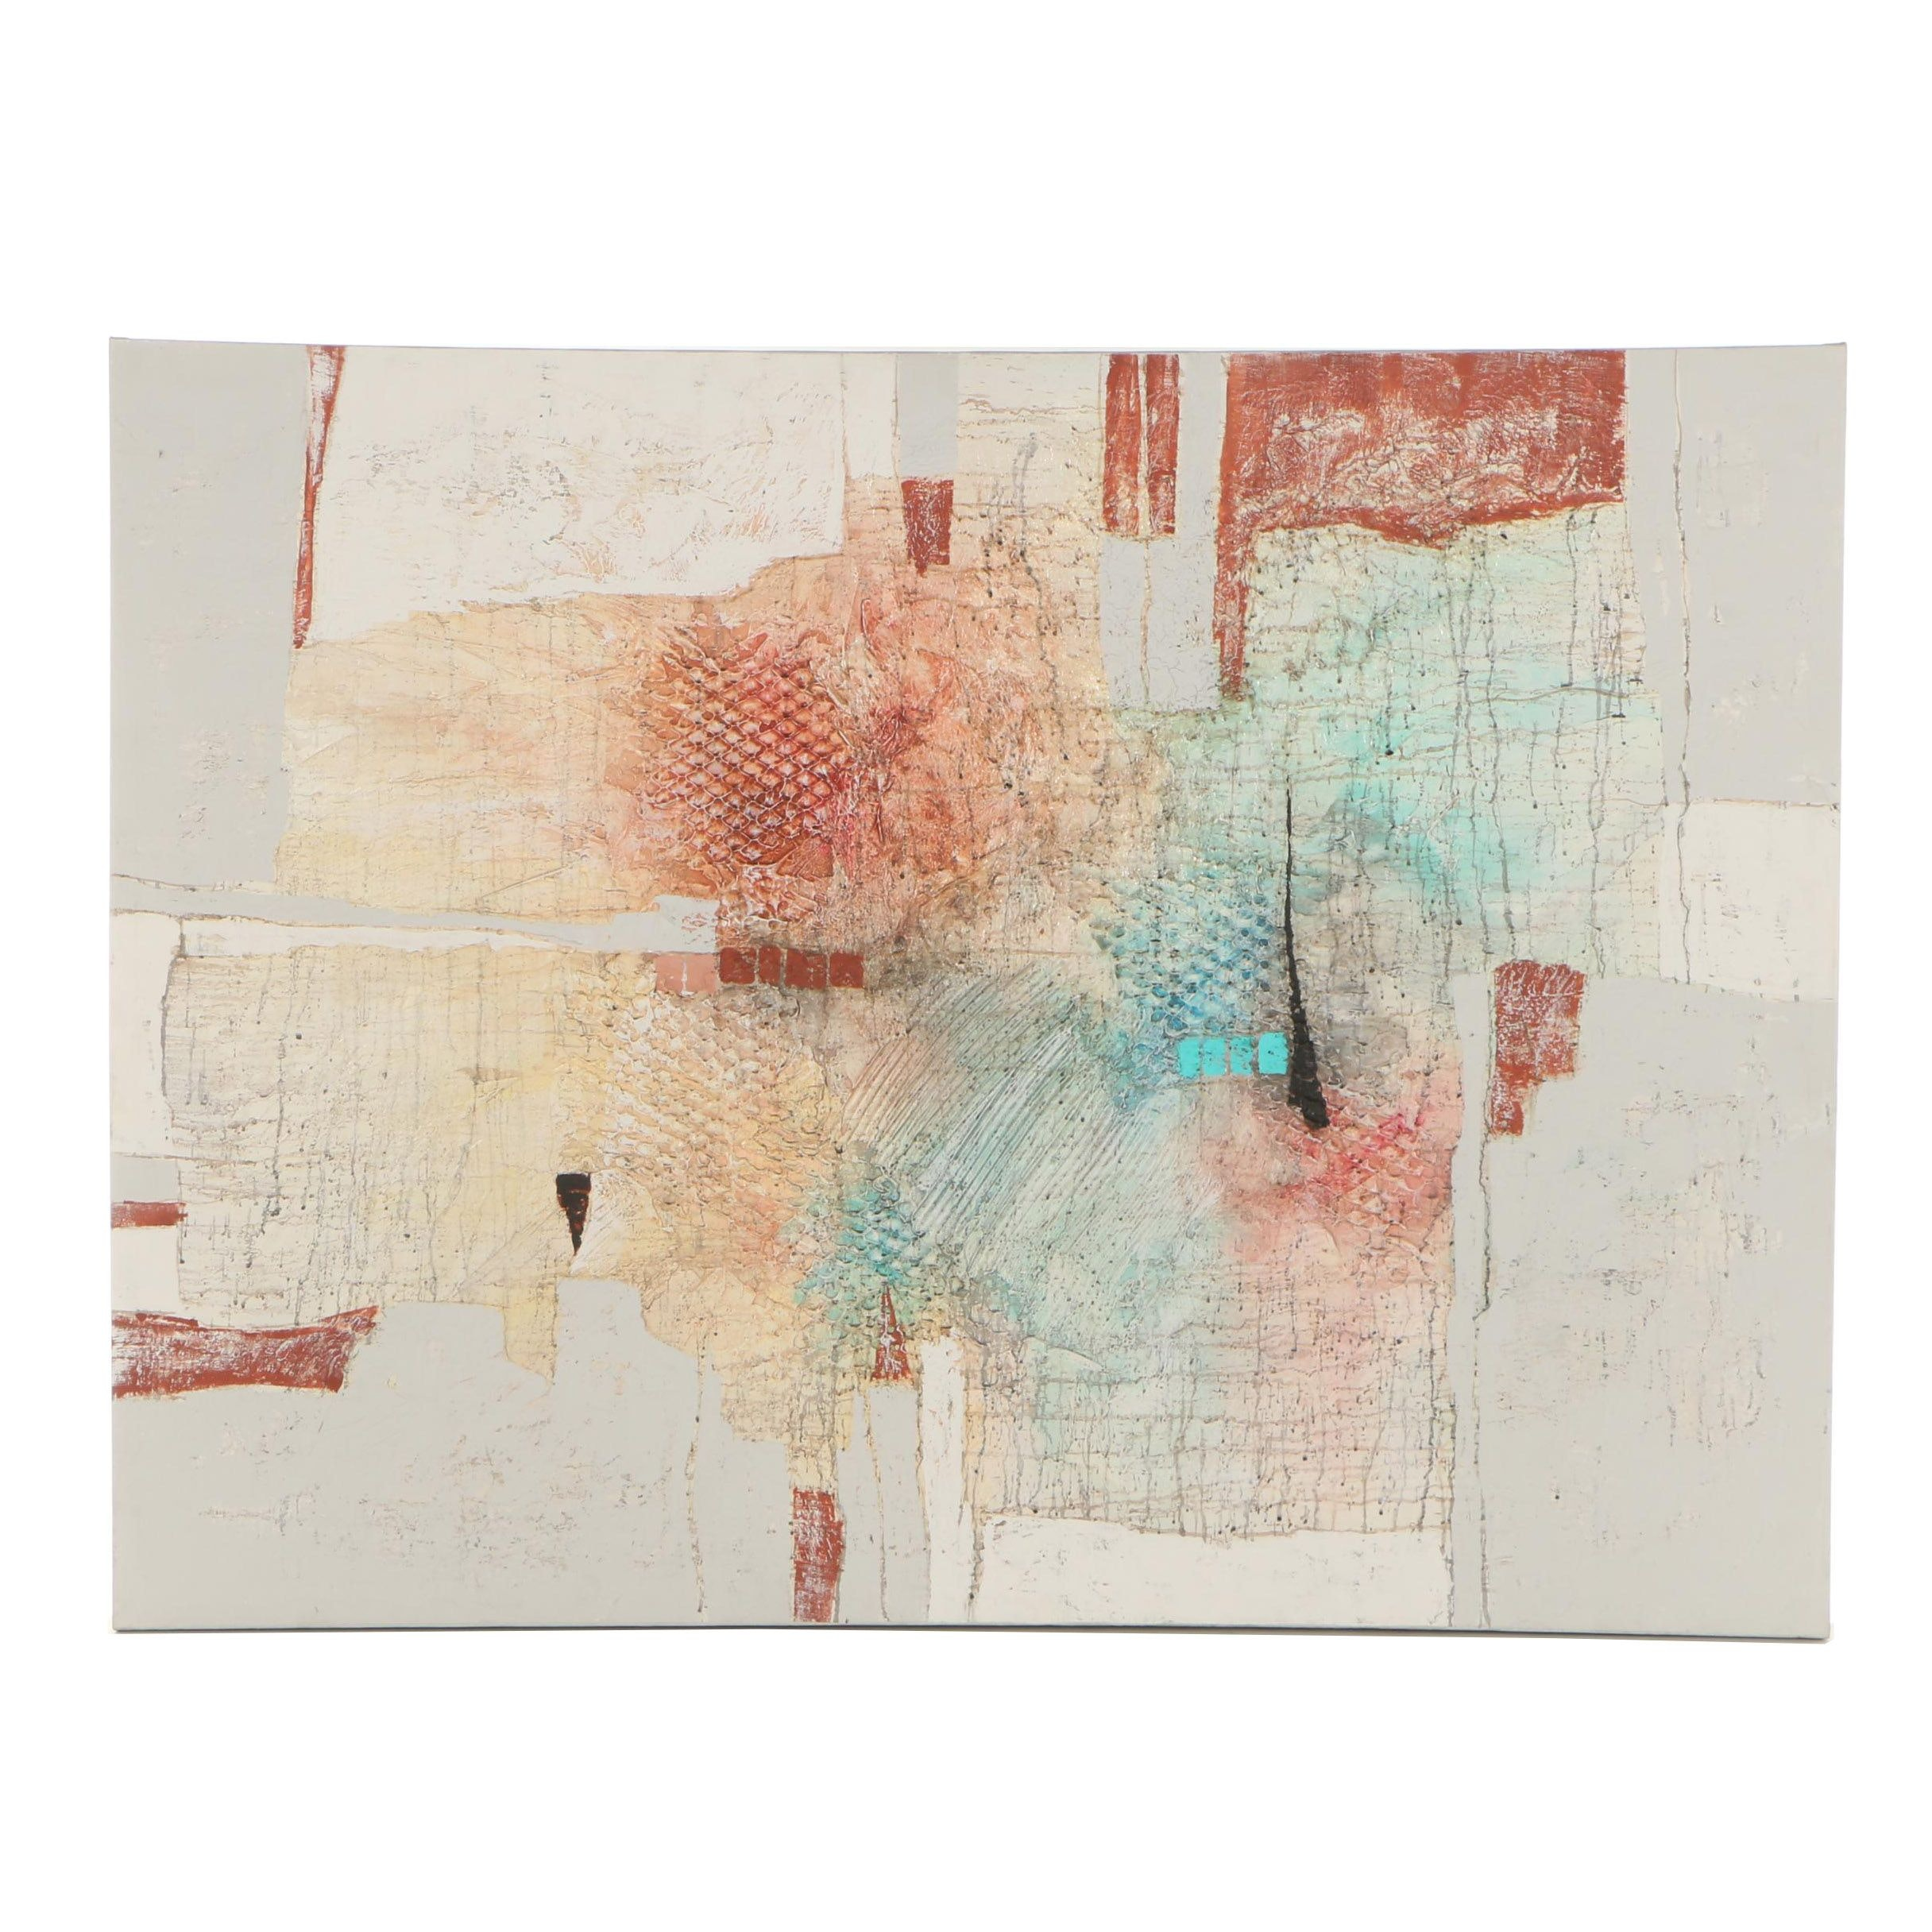 Abstract Acrylic Mixed Media Painting